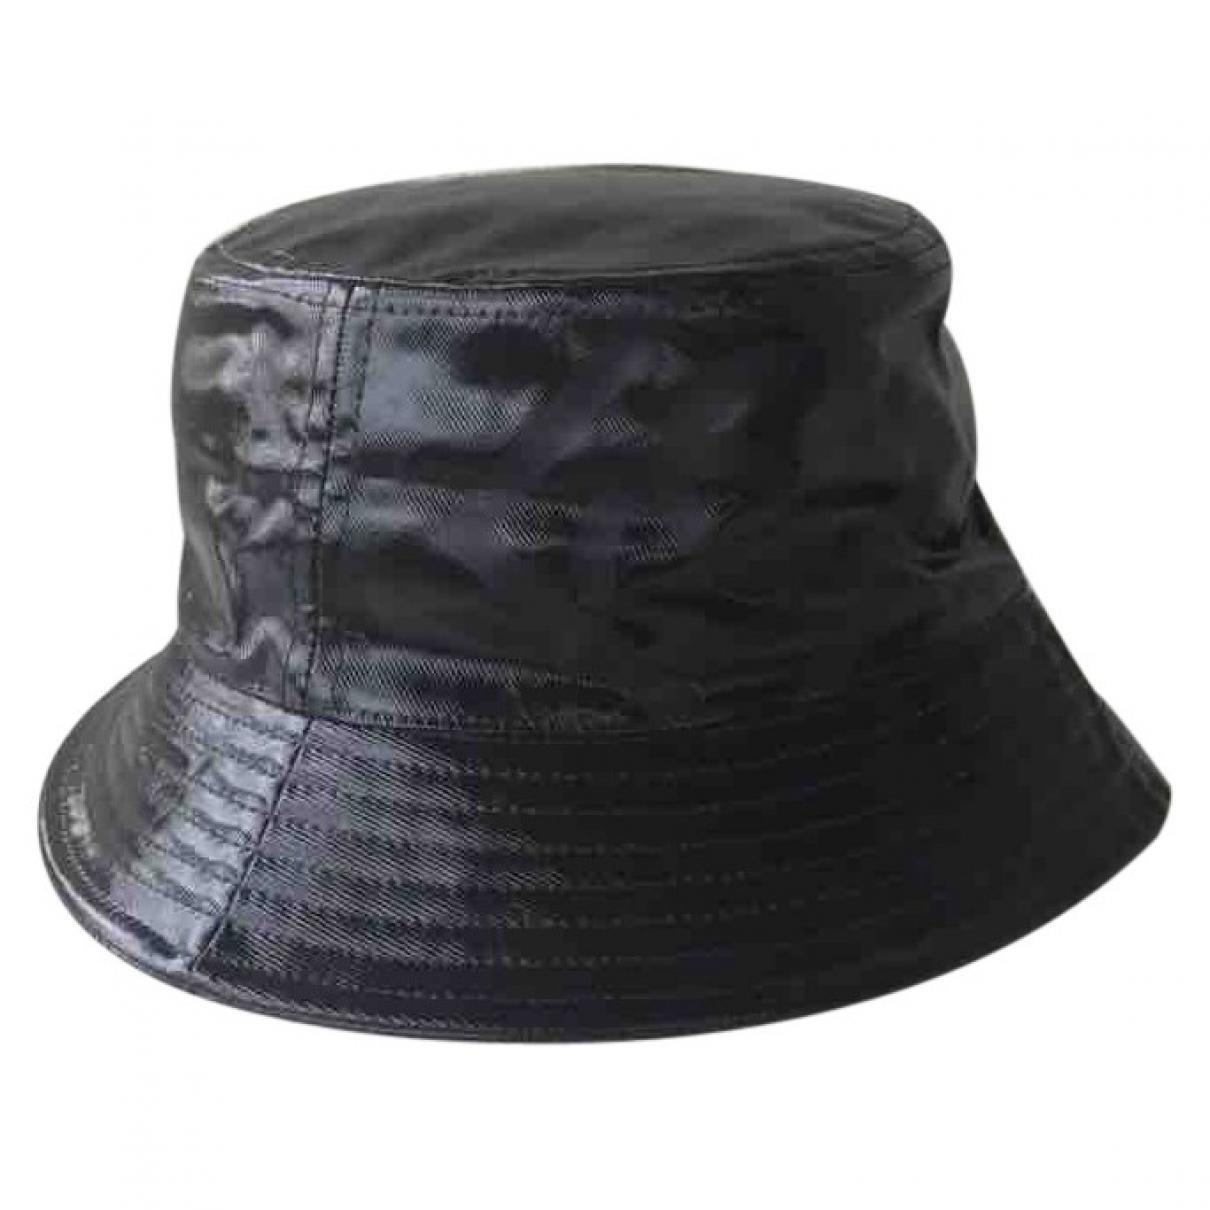 Chanel \N Black hat for Women 58 cm